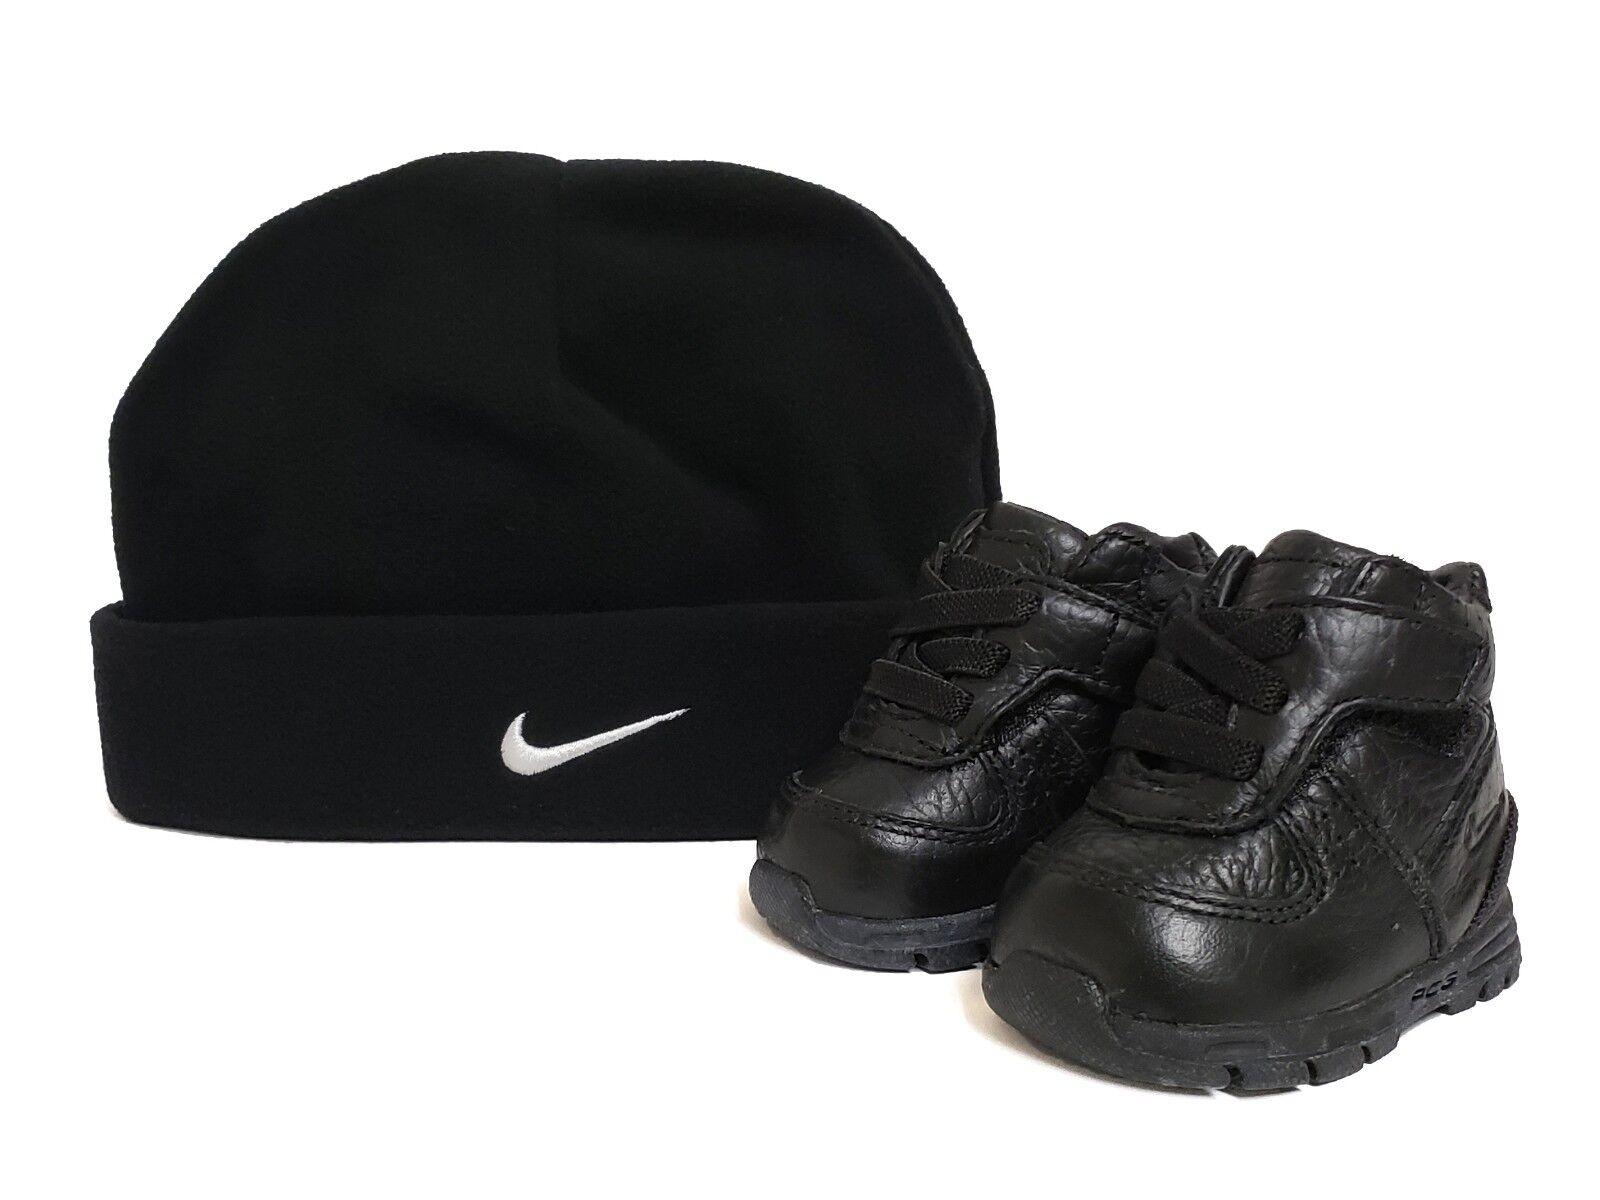 Nike Infant & Toddler FIRST GOADOME GP(CB) Shoes Black 313939-002 a10